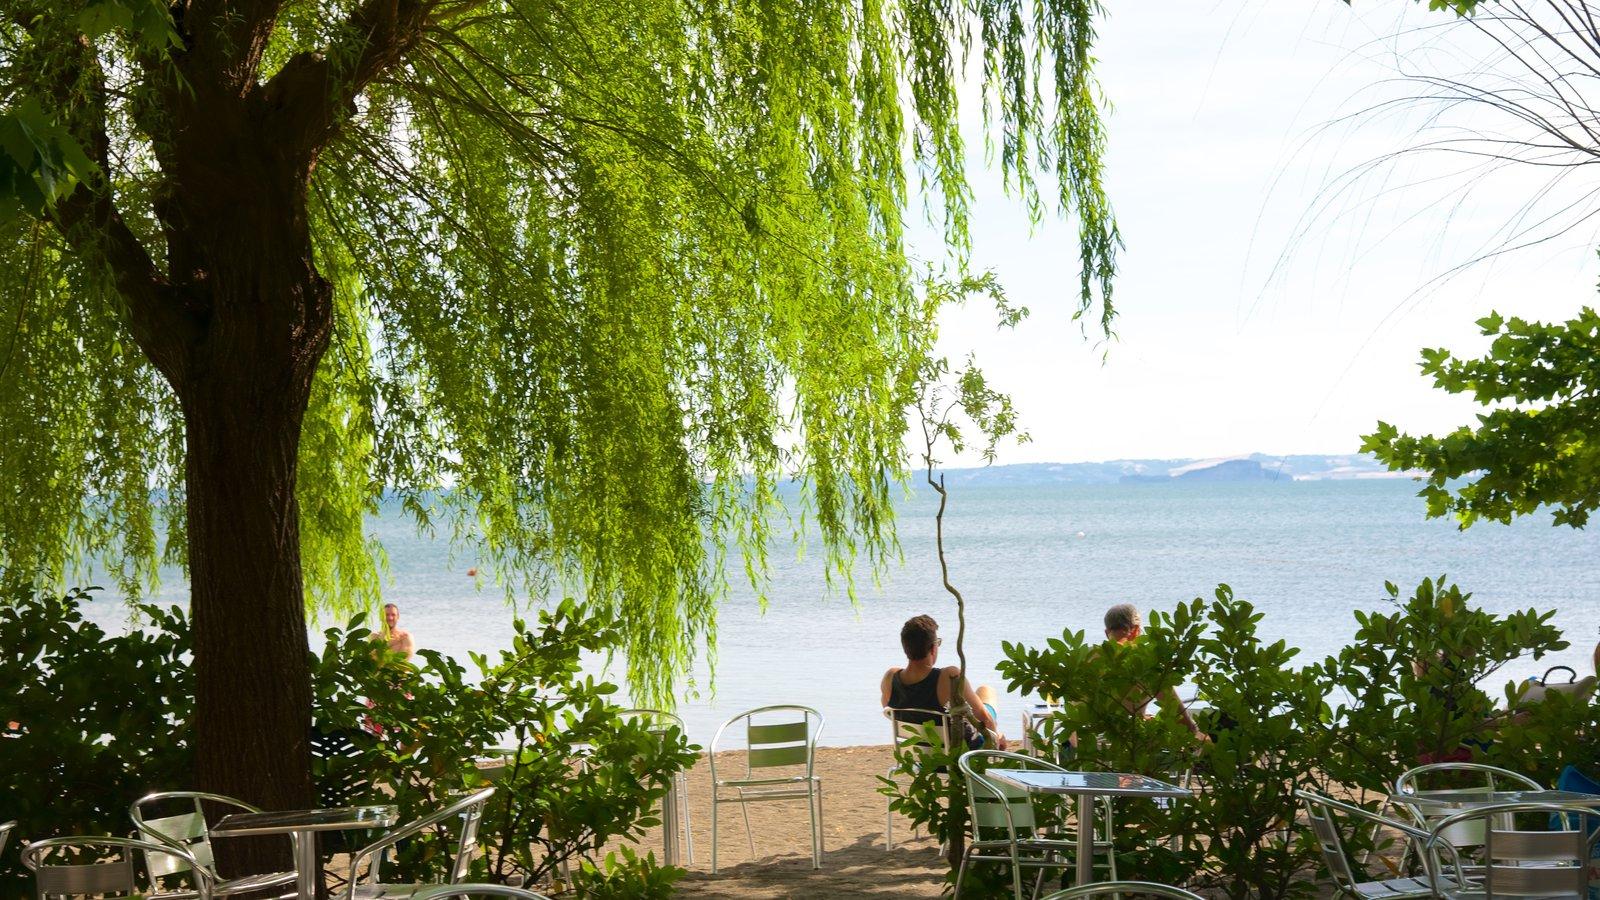 Lake Bolsena featuring general coastal views and a sandy beach